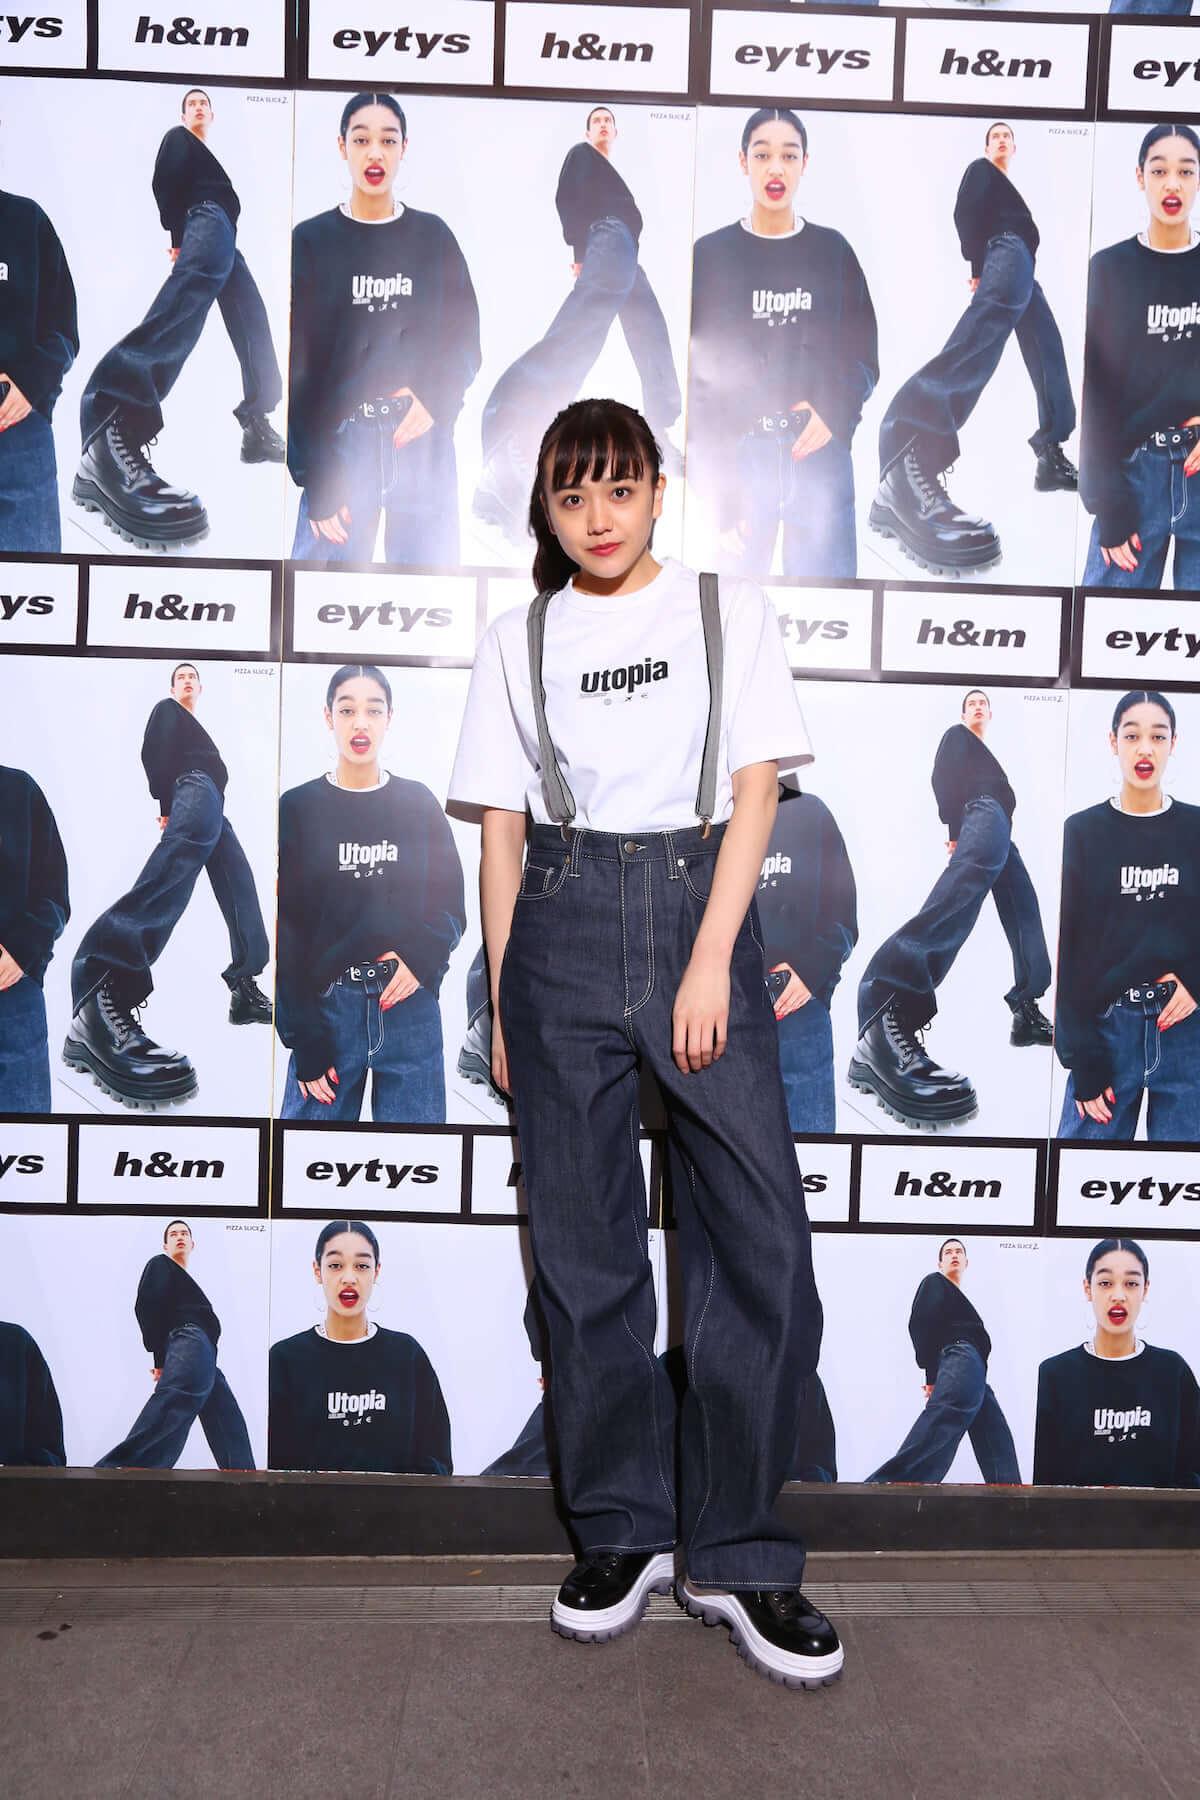 Eytys×H&Mのコラボコレクションが本日より発売開始 life-fashion190124-hm-eytys-7-1200x1800